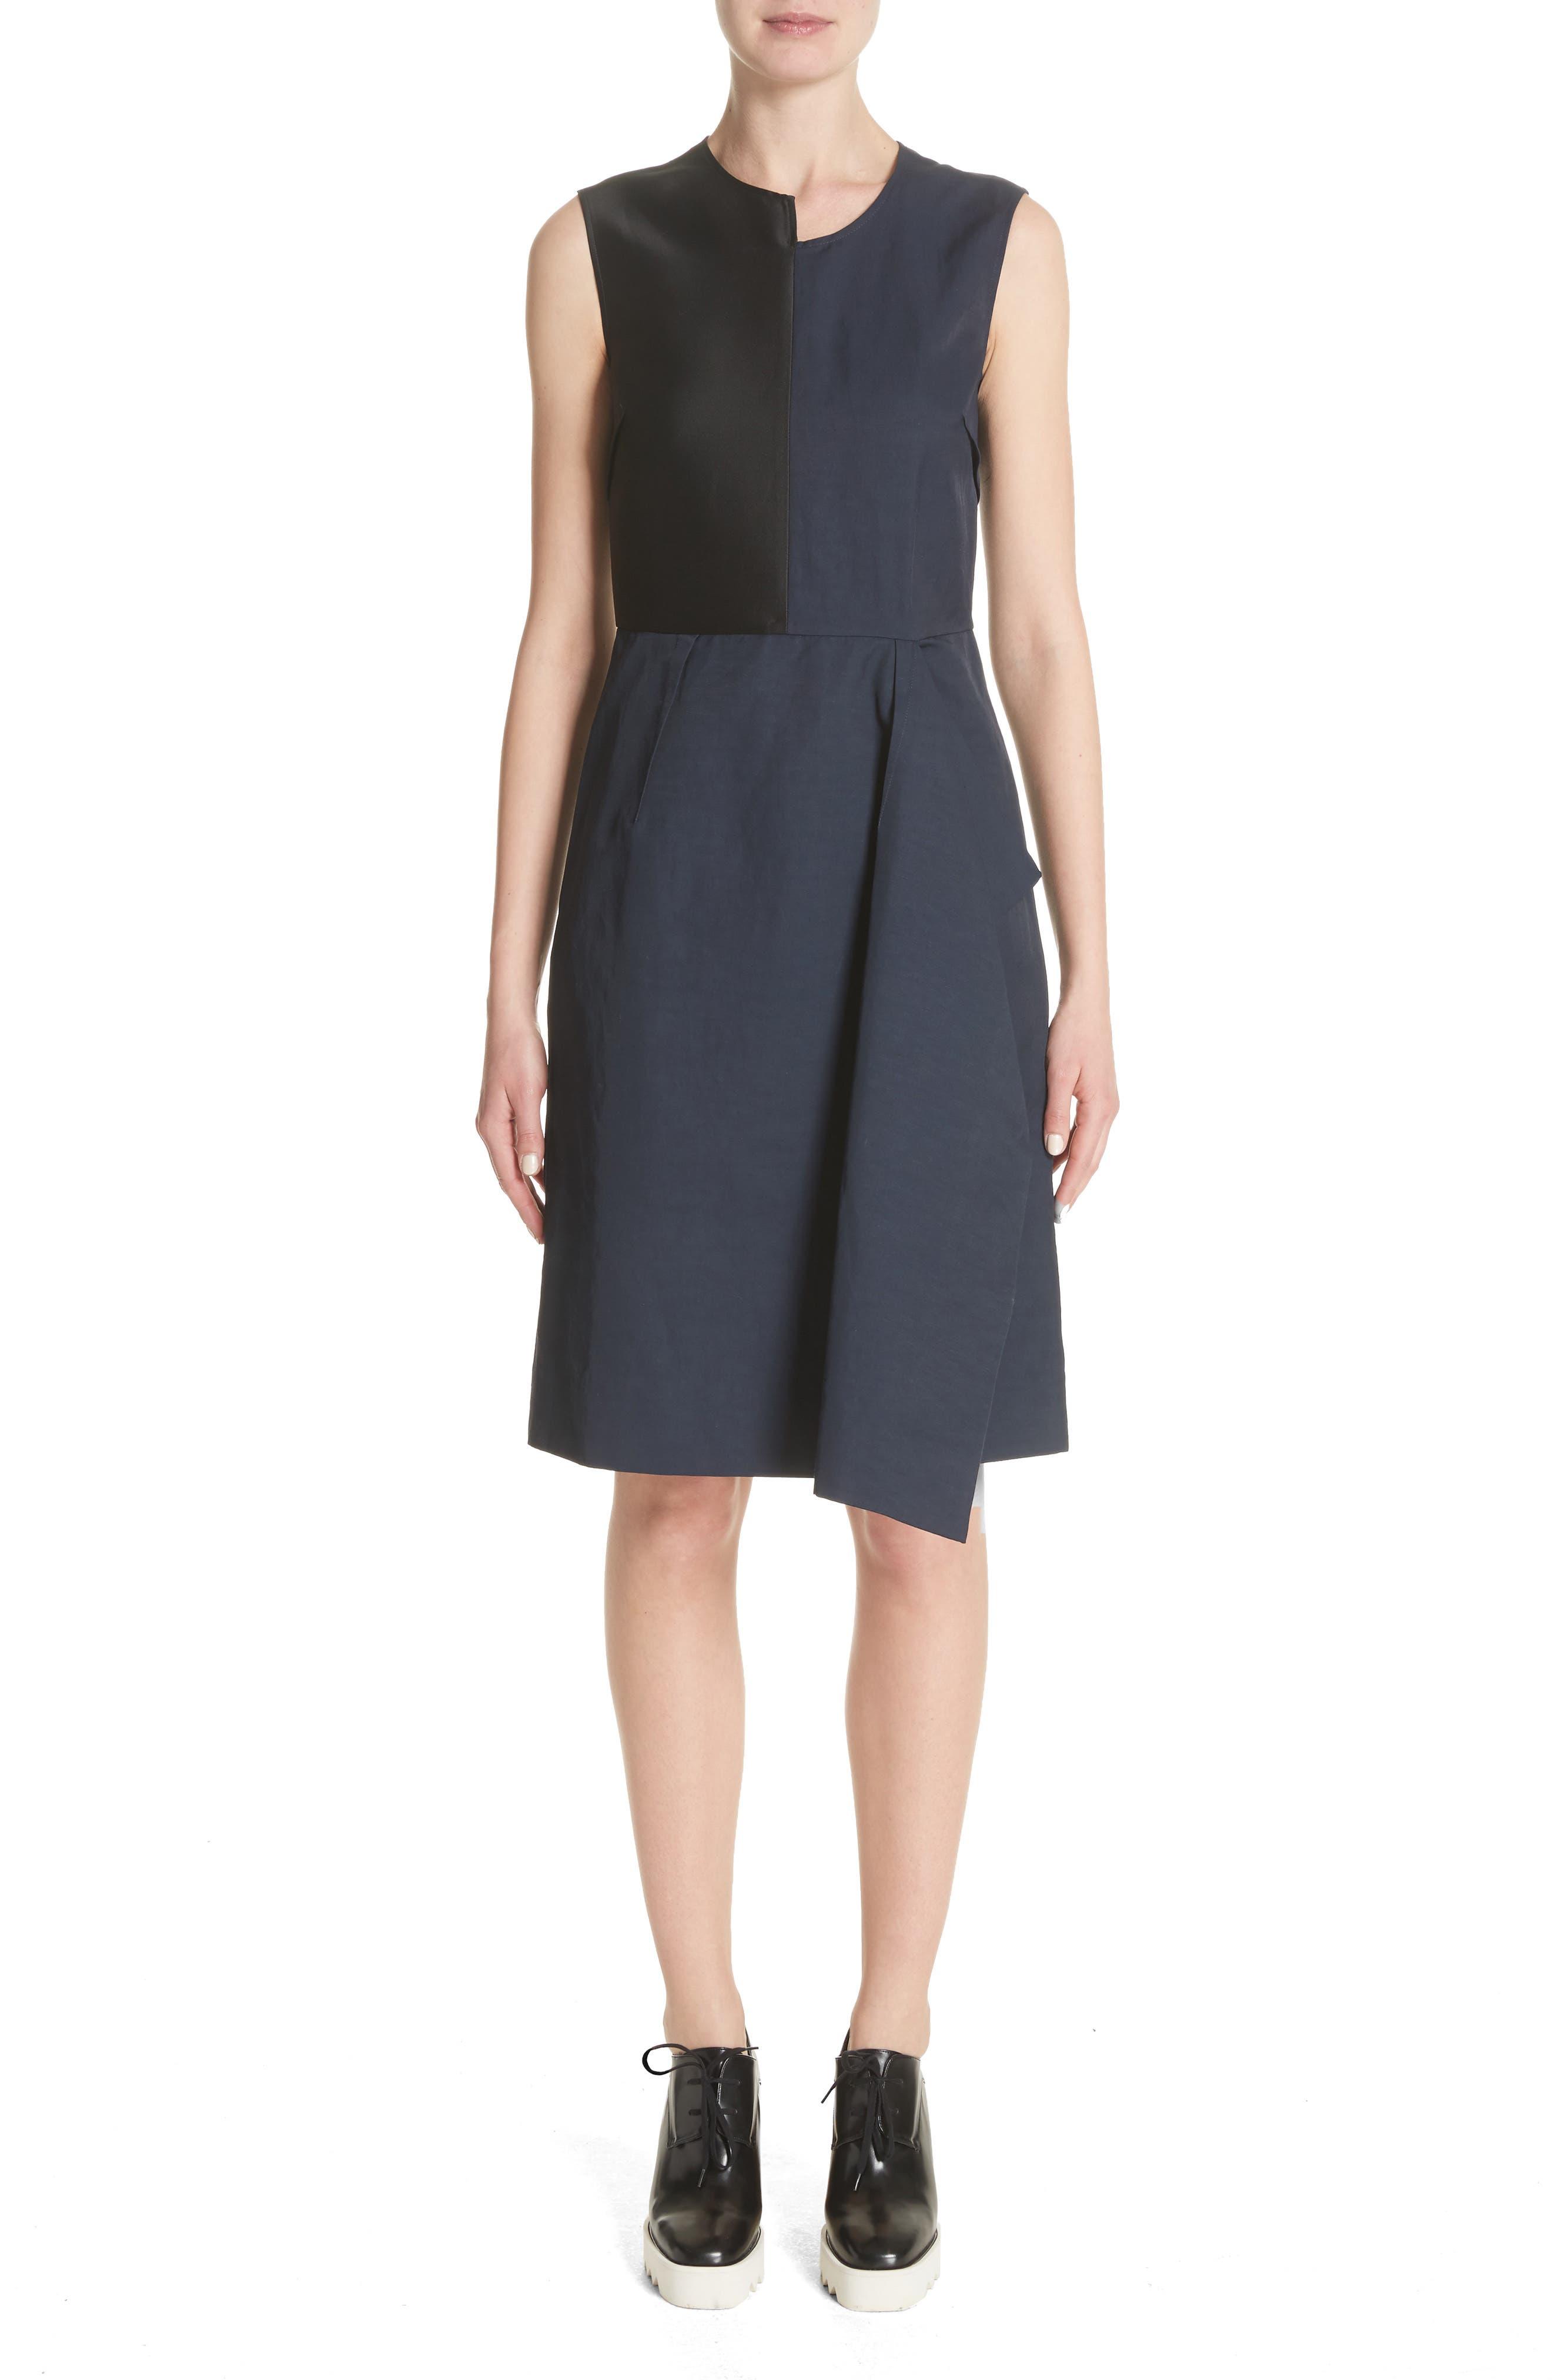 Alternate Image 1 Selected - Stella McCartney Patchwork A-Line Dress